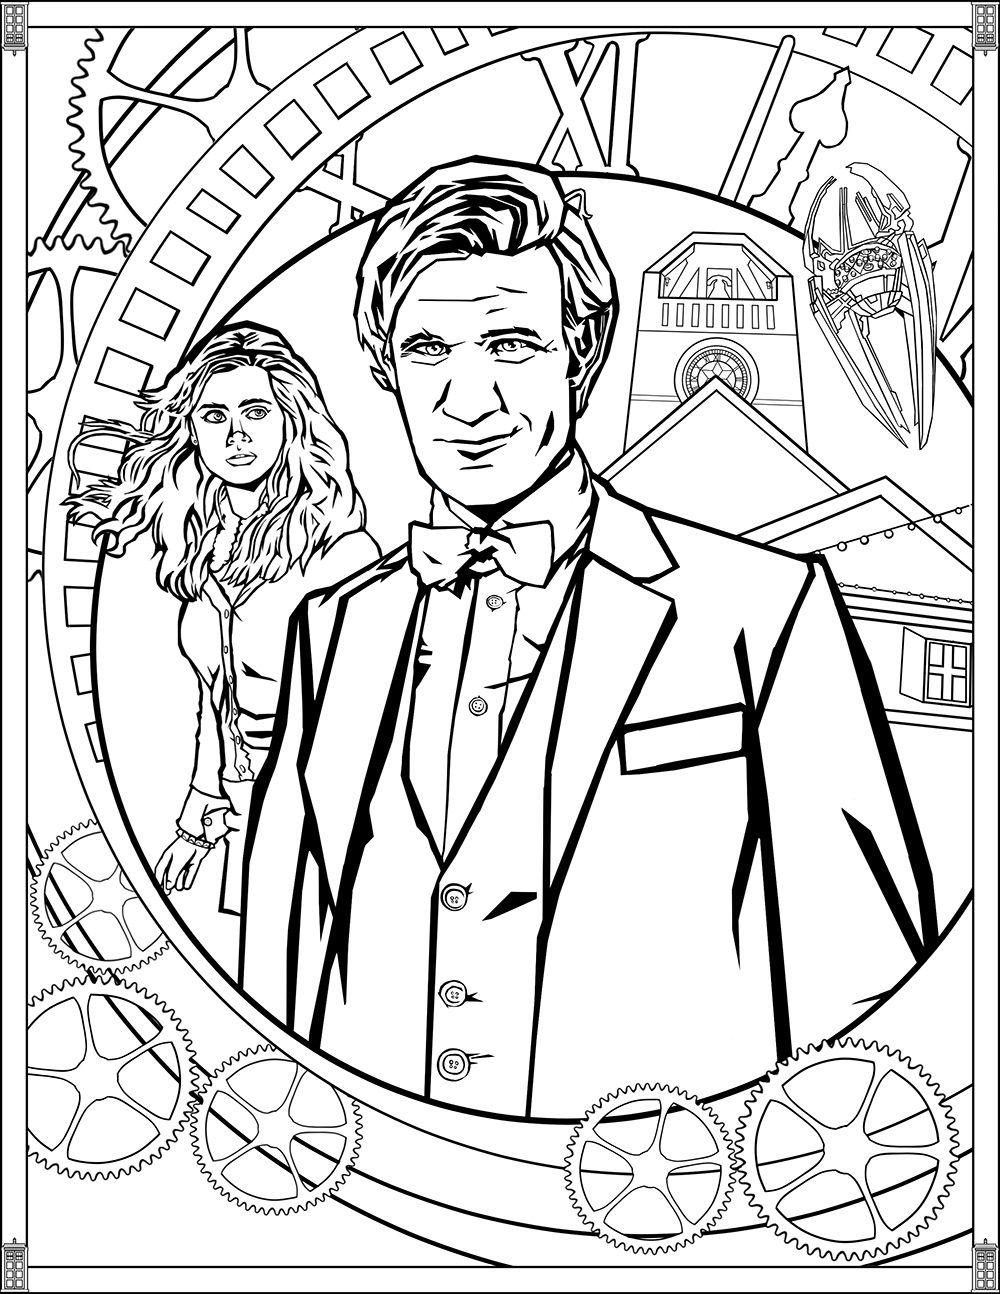 The Eleventh Doctor (Matt Smith) | Doctor Who | Fun.com | Pinterest